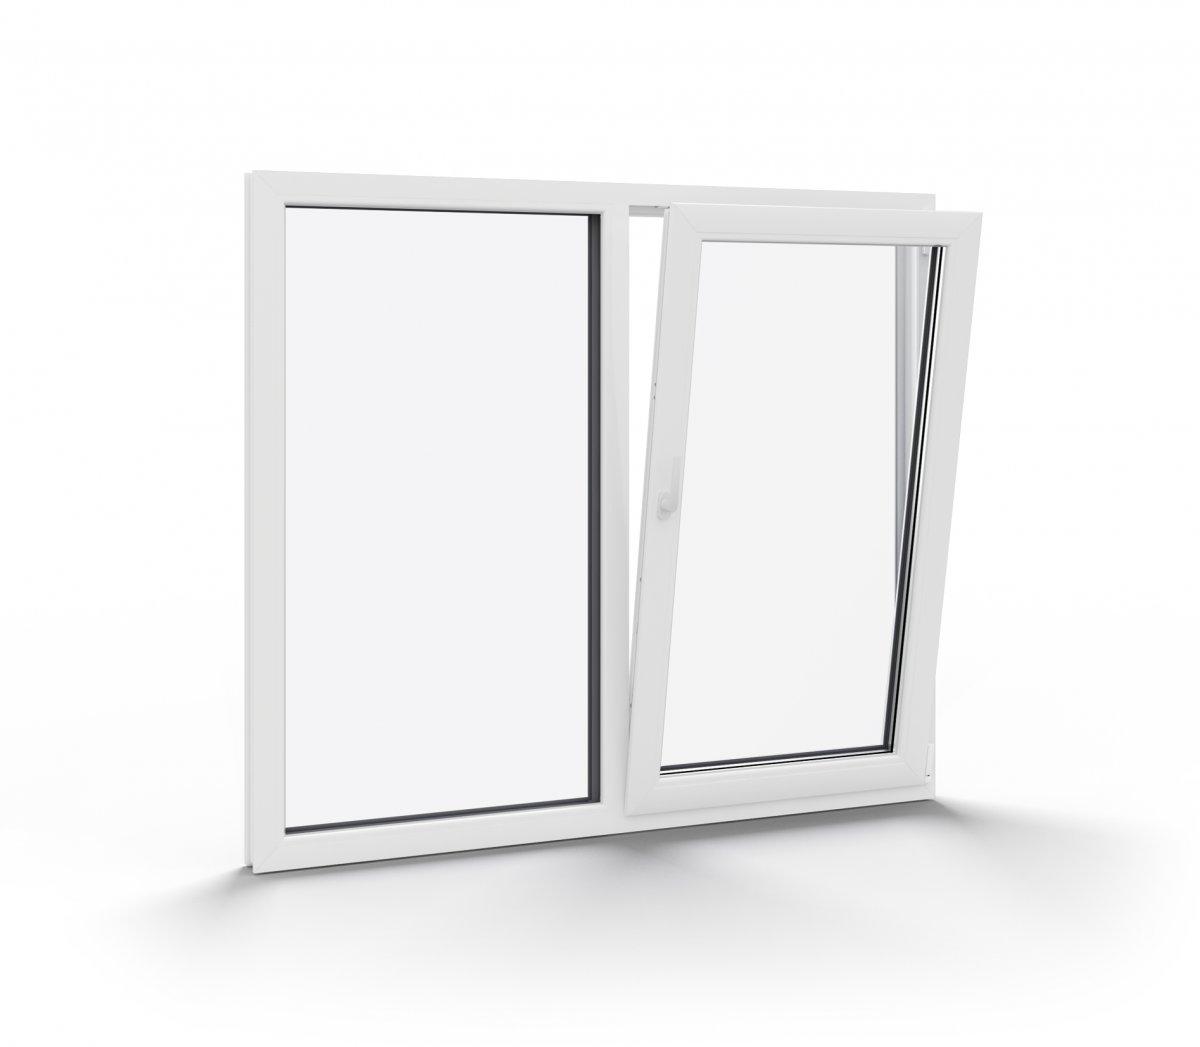 Вікна для квартири - Фото 2